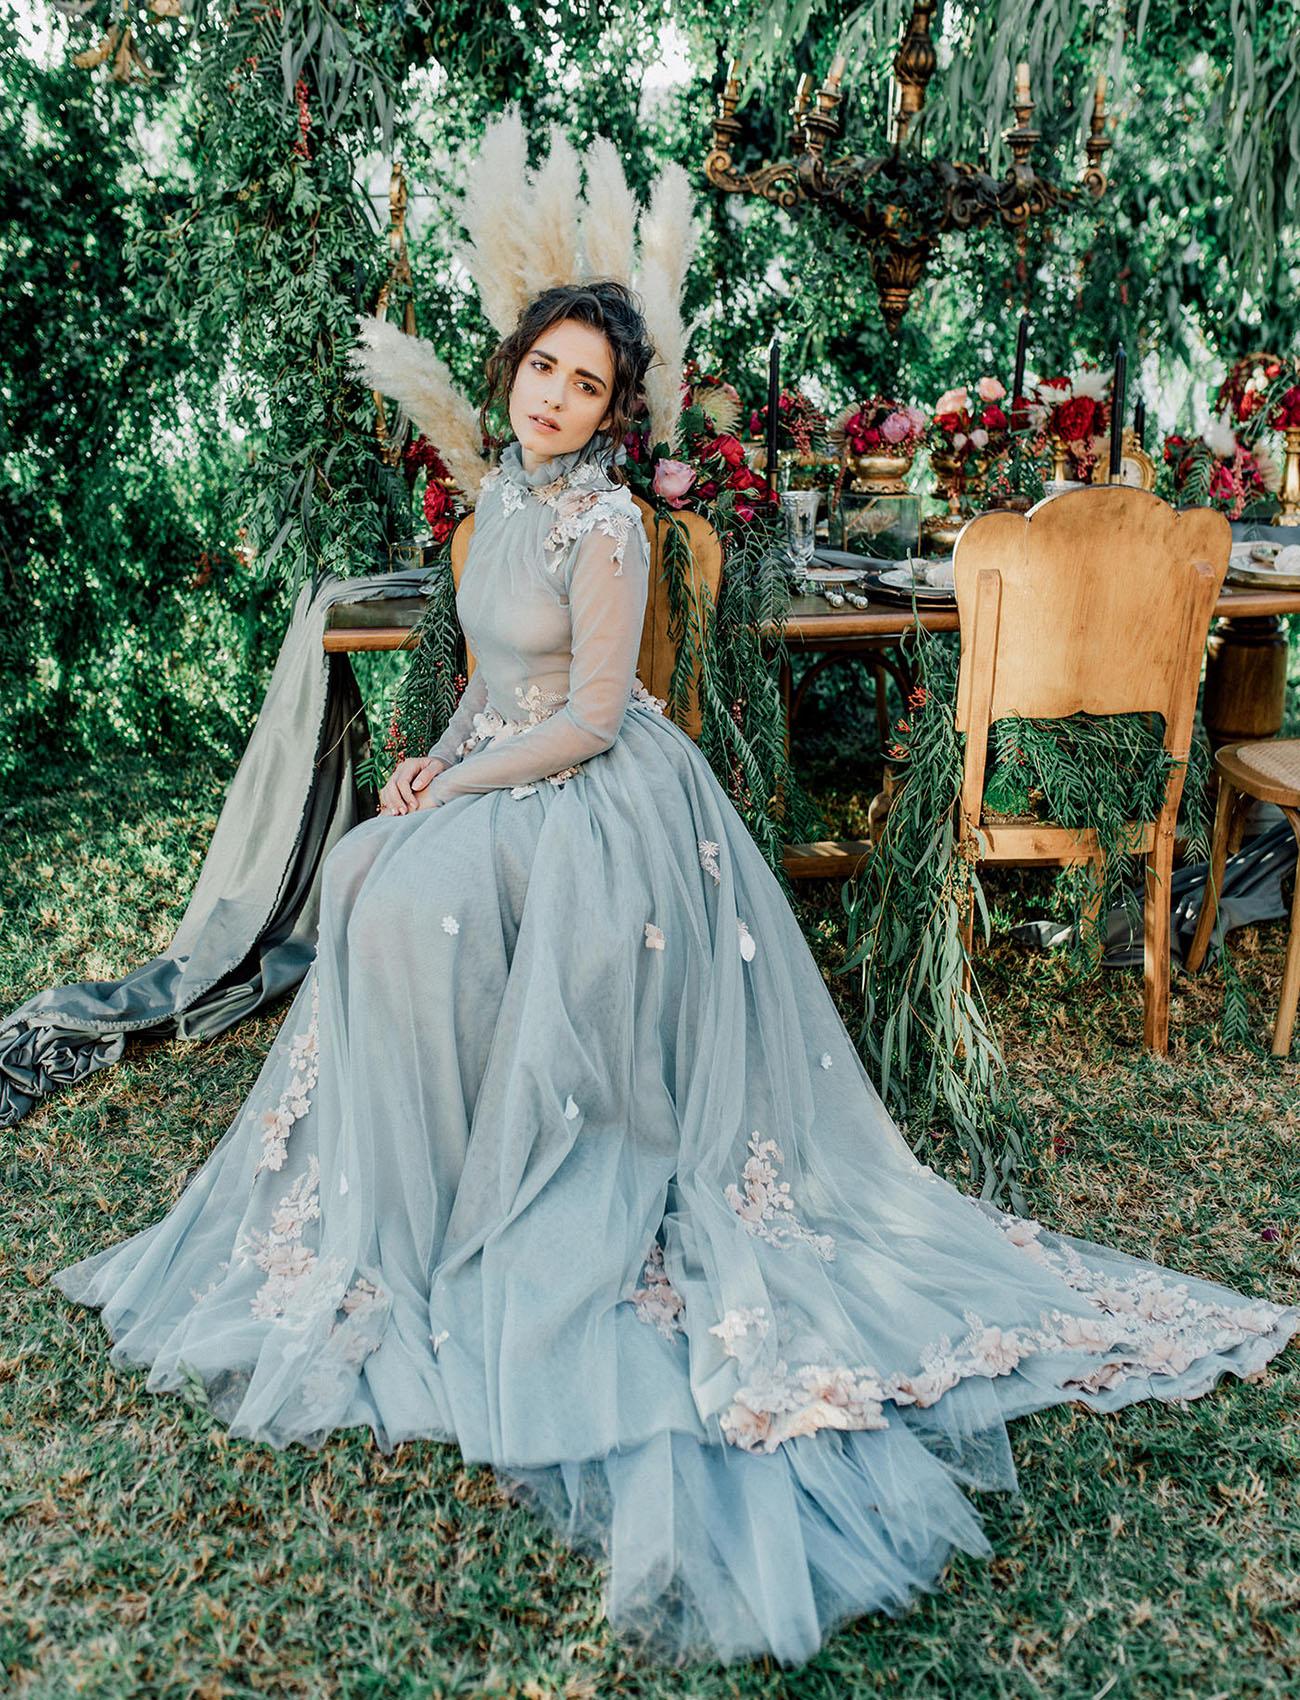 Secret Garden: Our Favorite Wedding Dresses With A Pop Of Color!